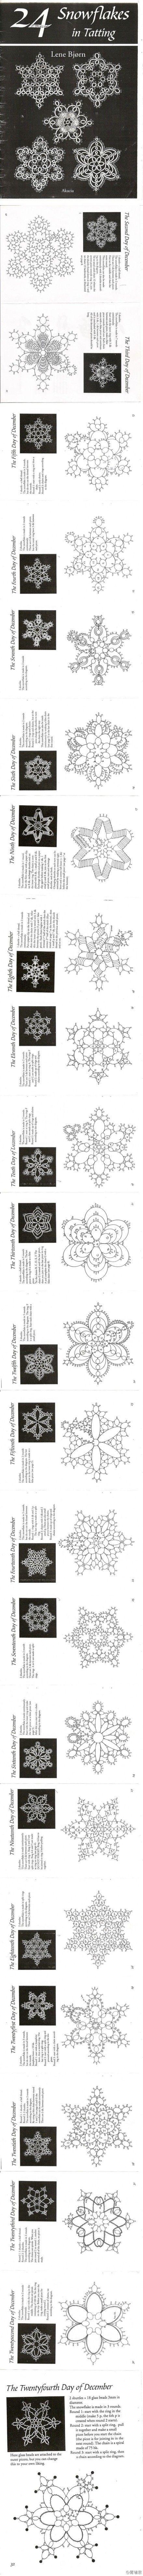 Snowflakes patterns